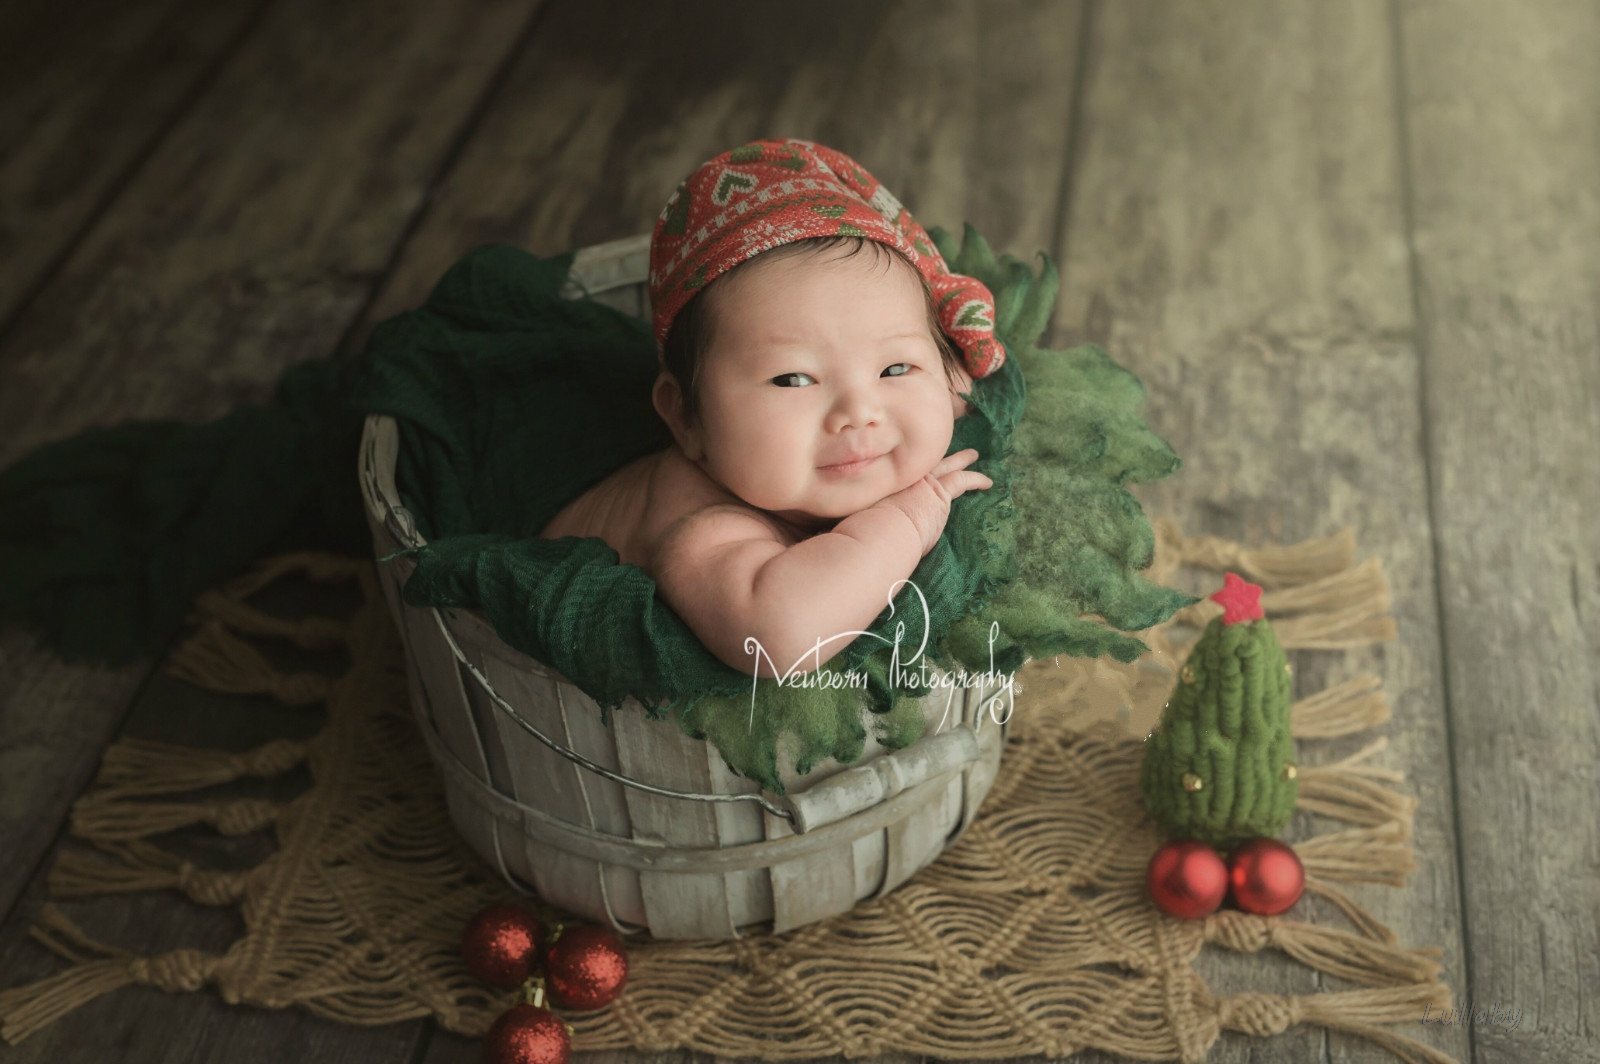 Baby Photography Props Wooden Posing Container Wooden Bucket Newborn Baby Shoot Accessories Studio Creative Retro Posing Props